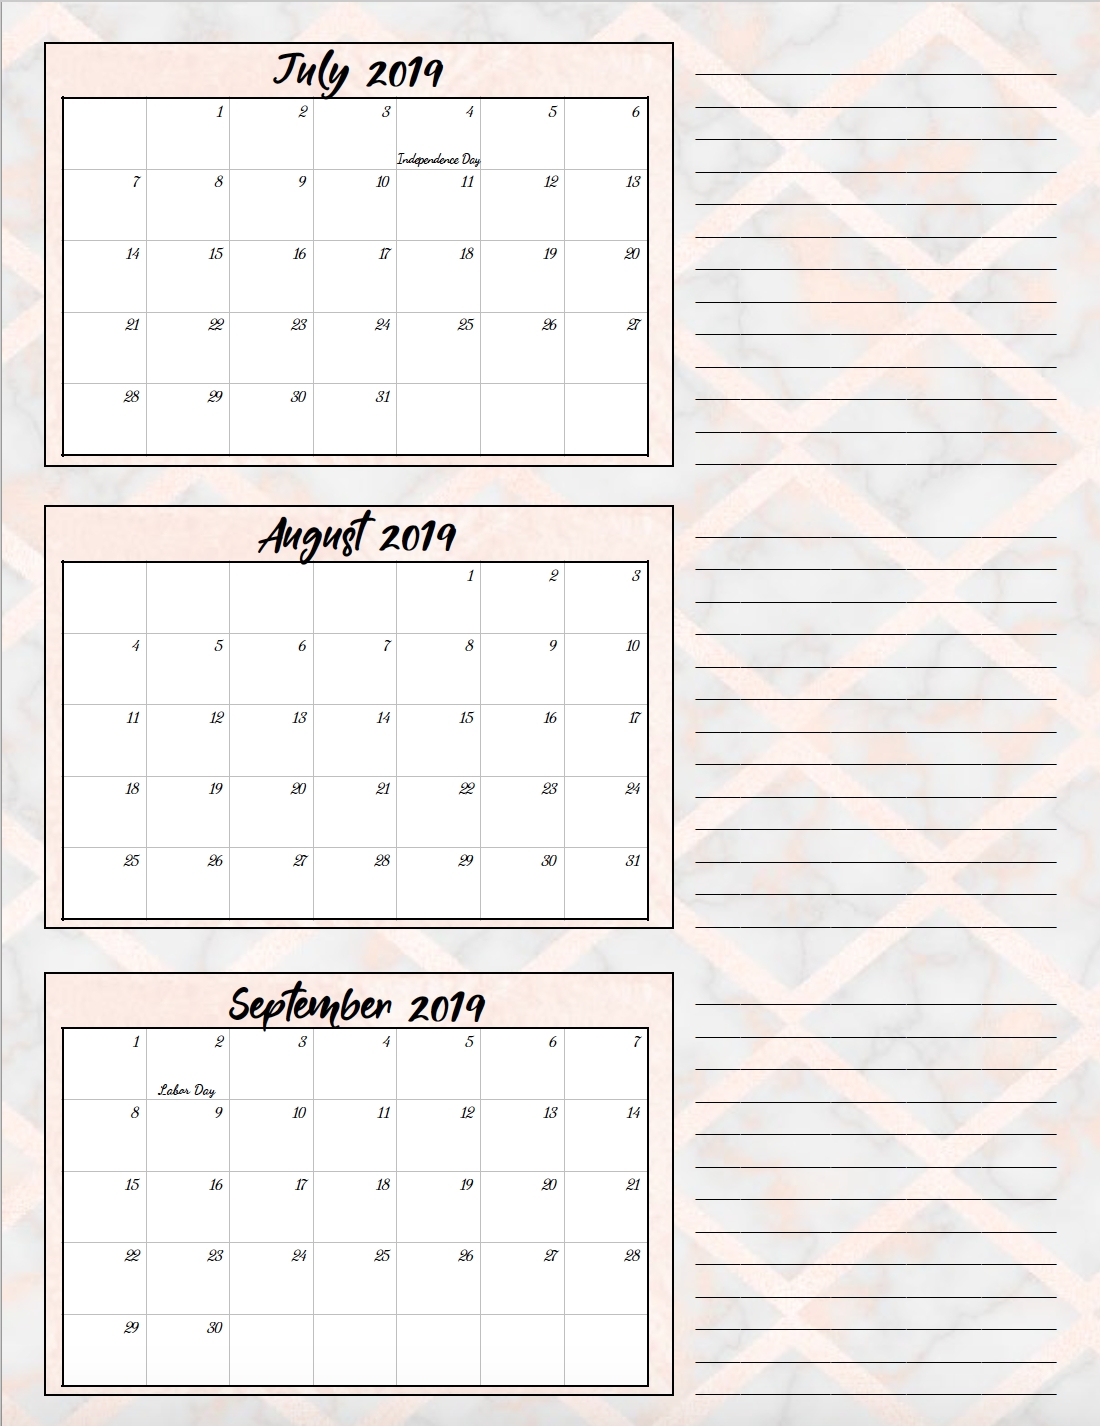 Free Printable 2019 Quarterly Calendars With Holidays: 3